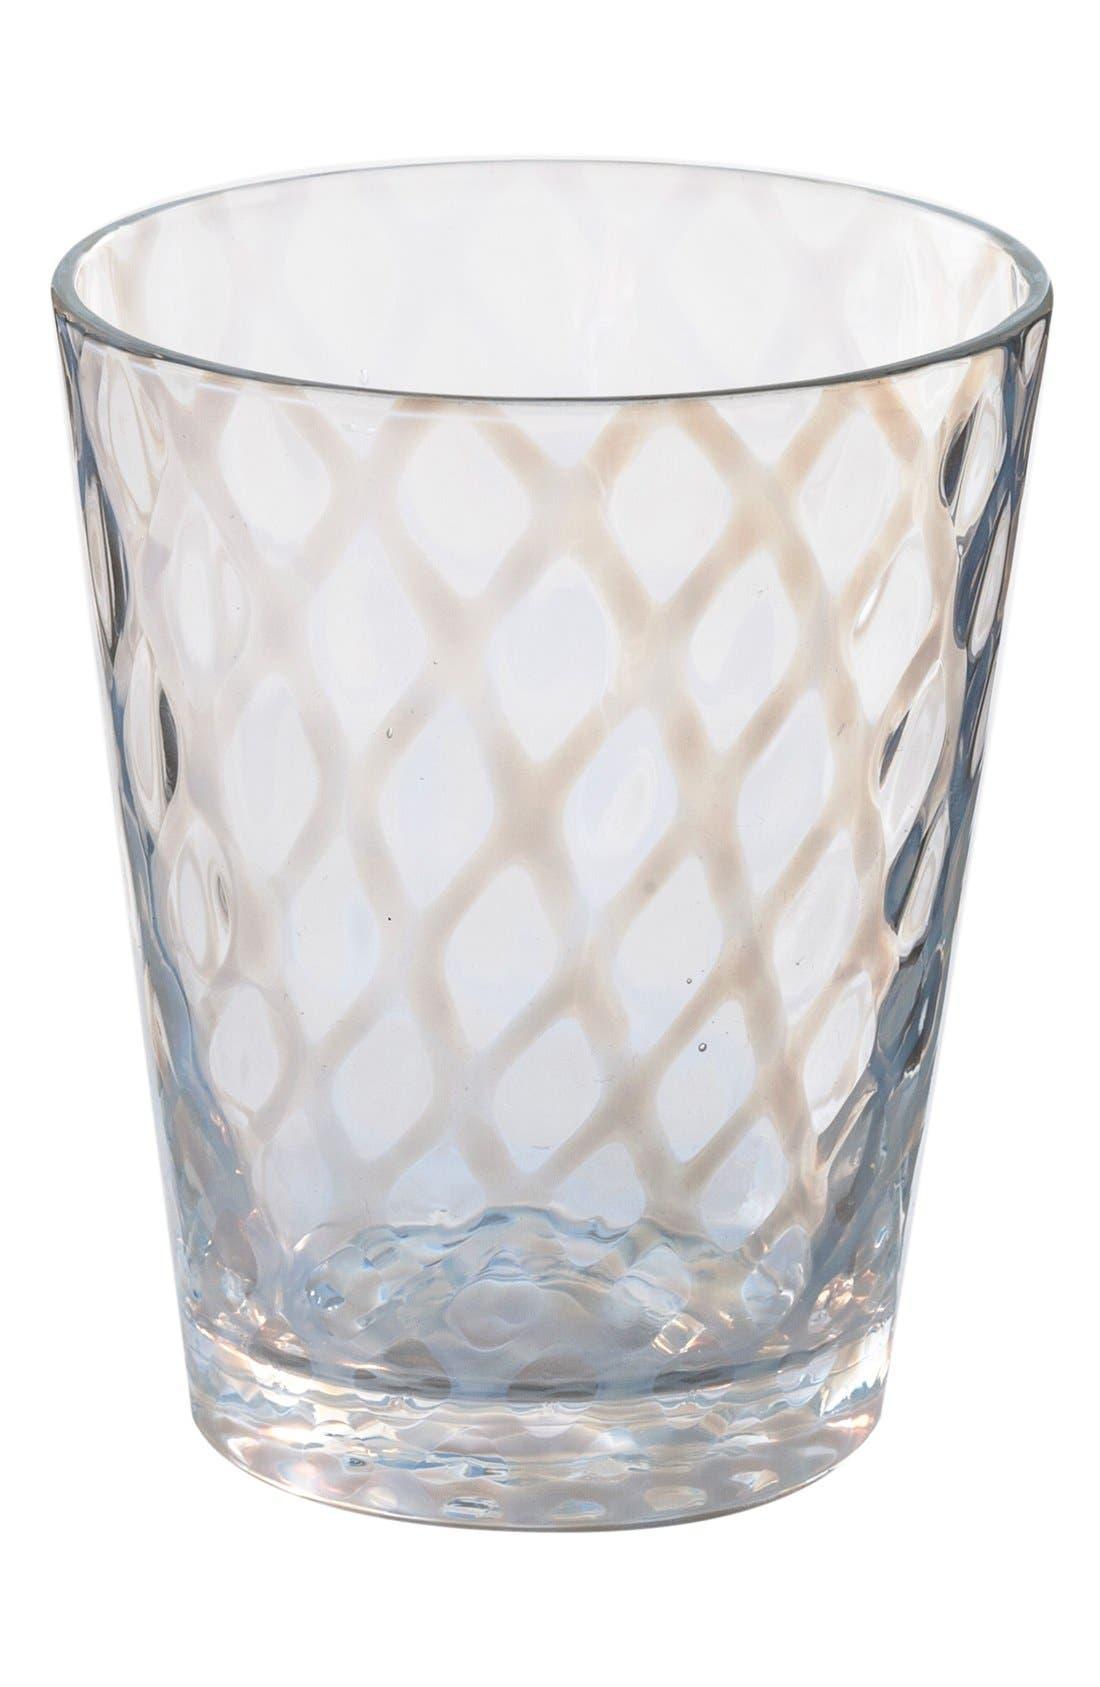 Main Image - Rosanna 'Lattice' Double Old Fashioned Glasses (Set of 4)